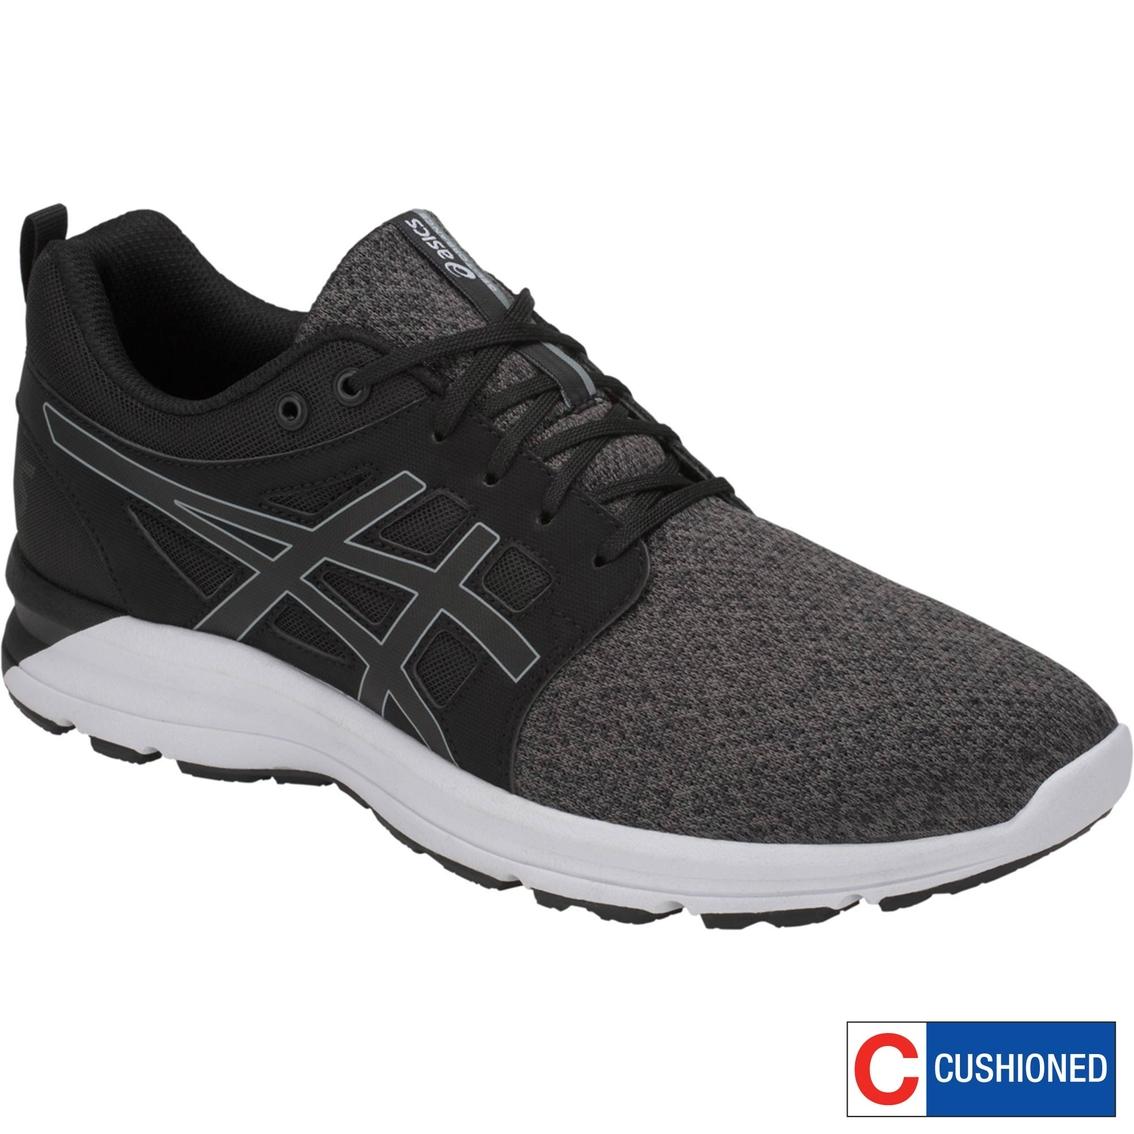 Asics Synthetic Gel torrance Running Shoes in Black for Men